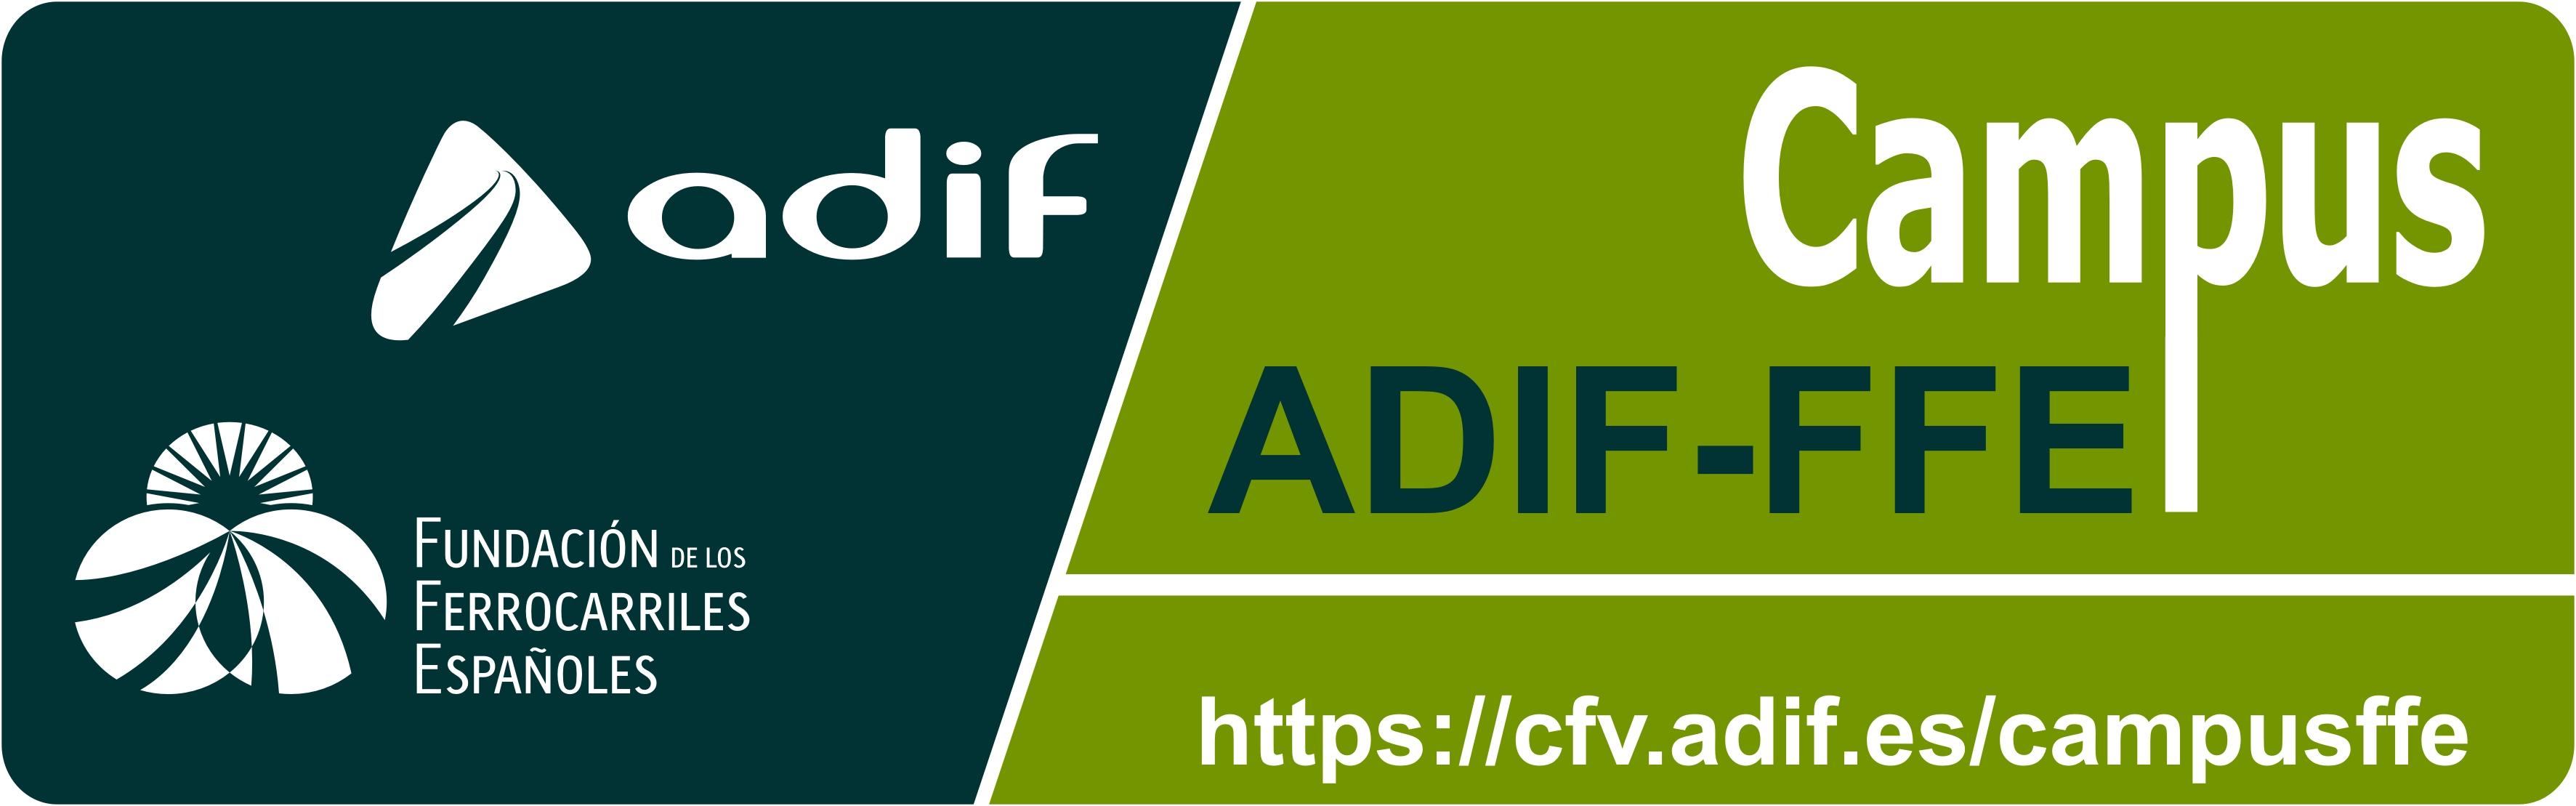 Campus ADIF-FFE: Aulas ADIF (septiembre a diciembre 2019)